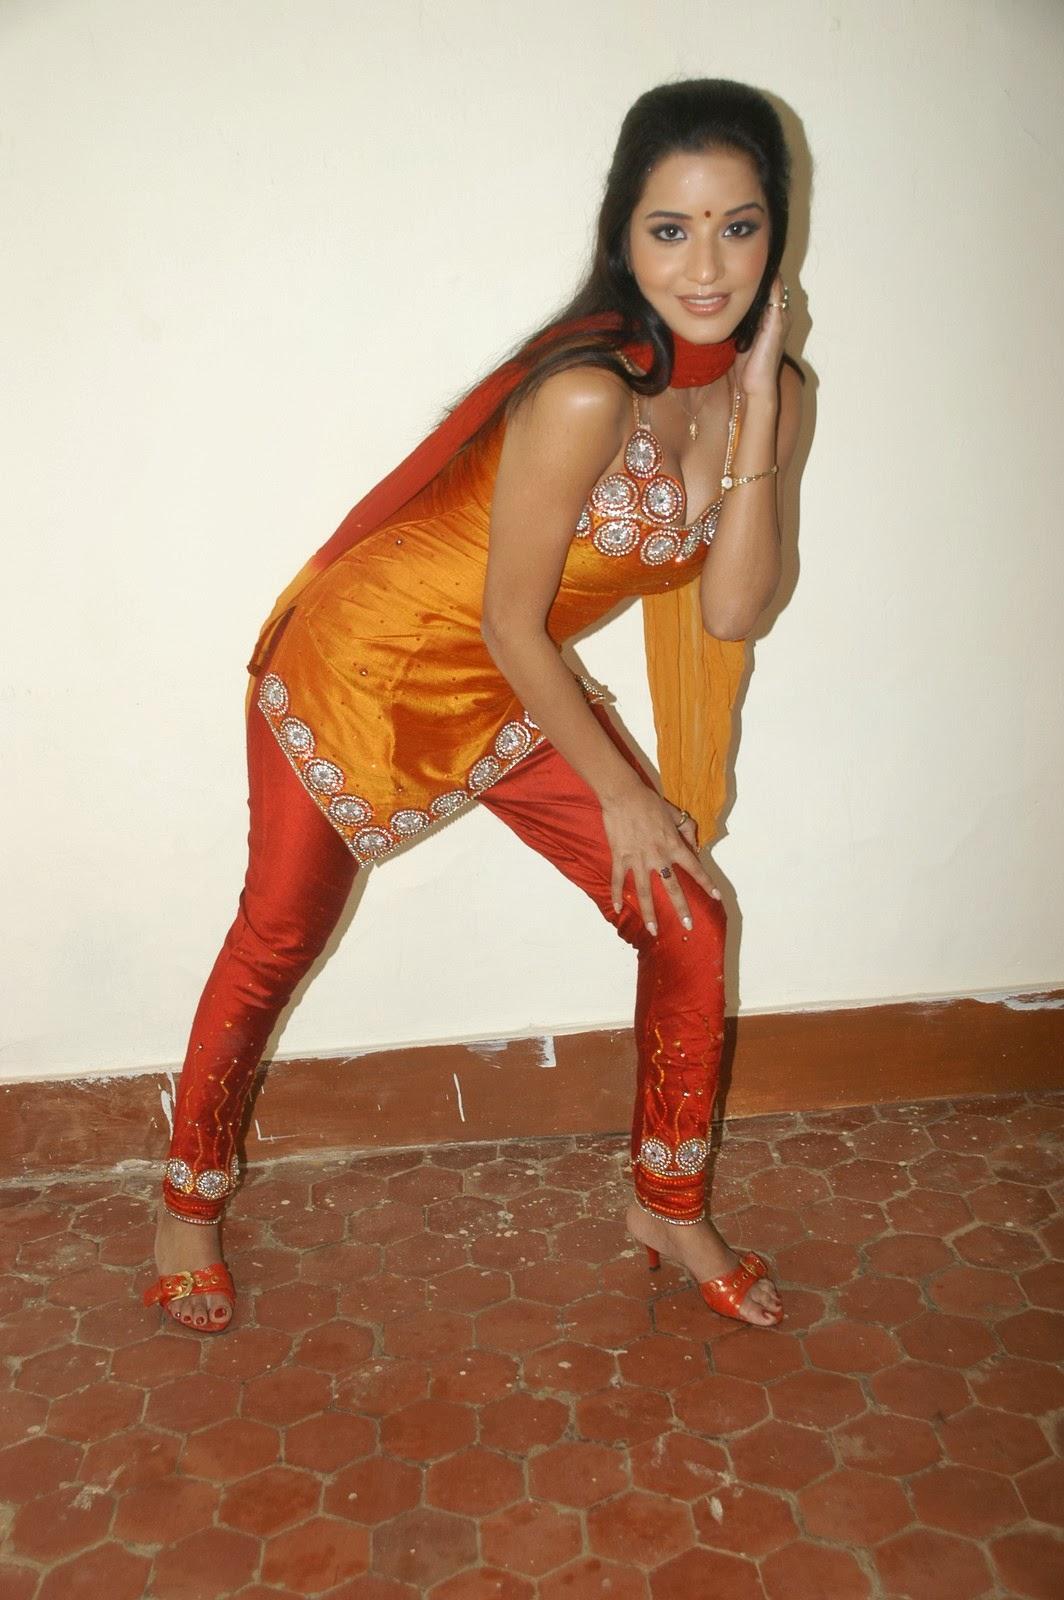 nude teen indian girls